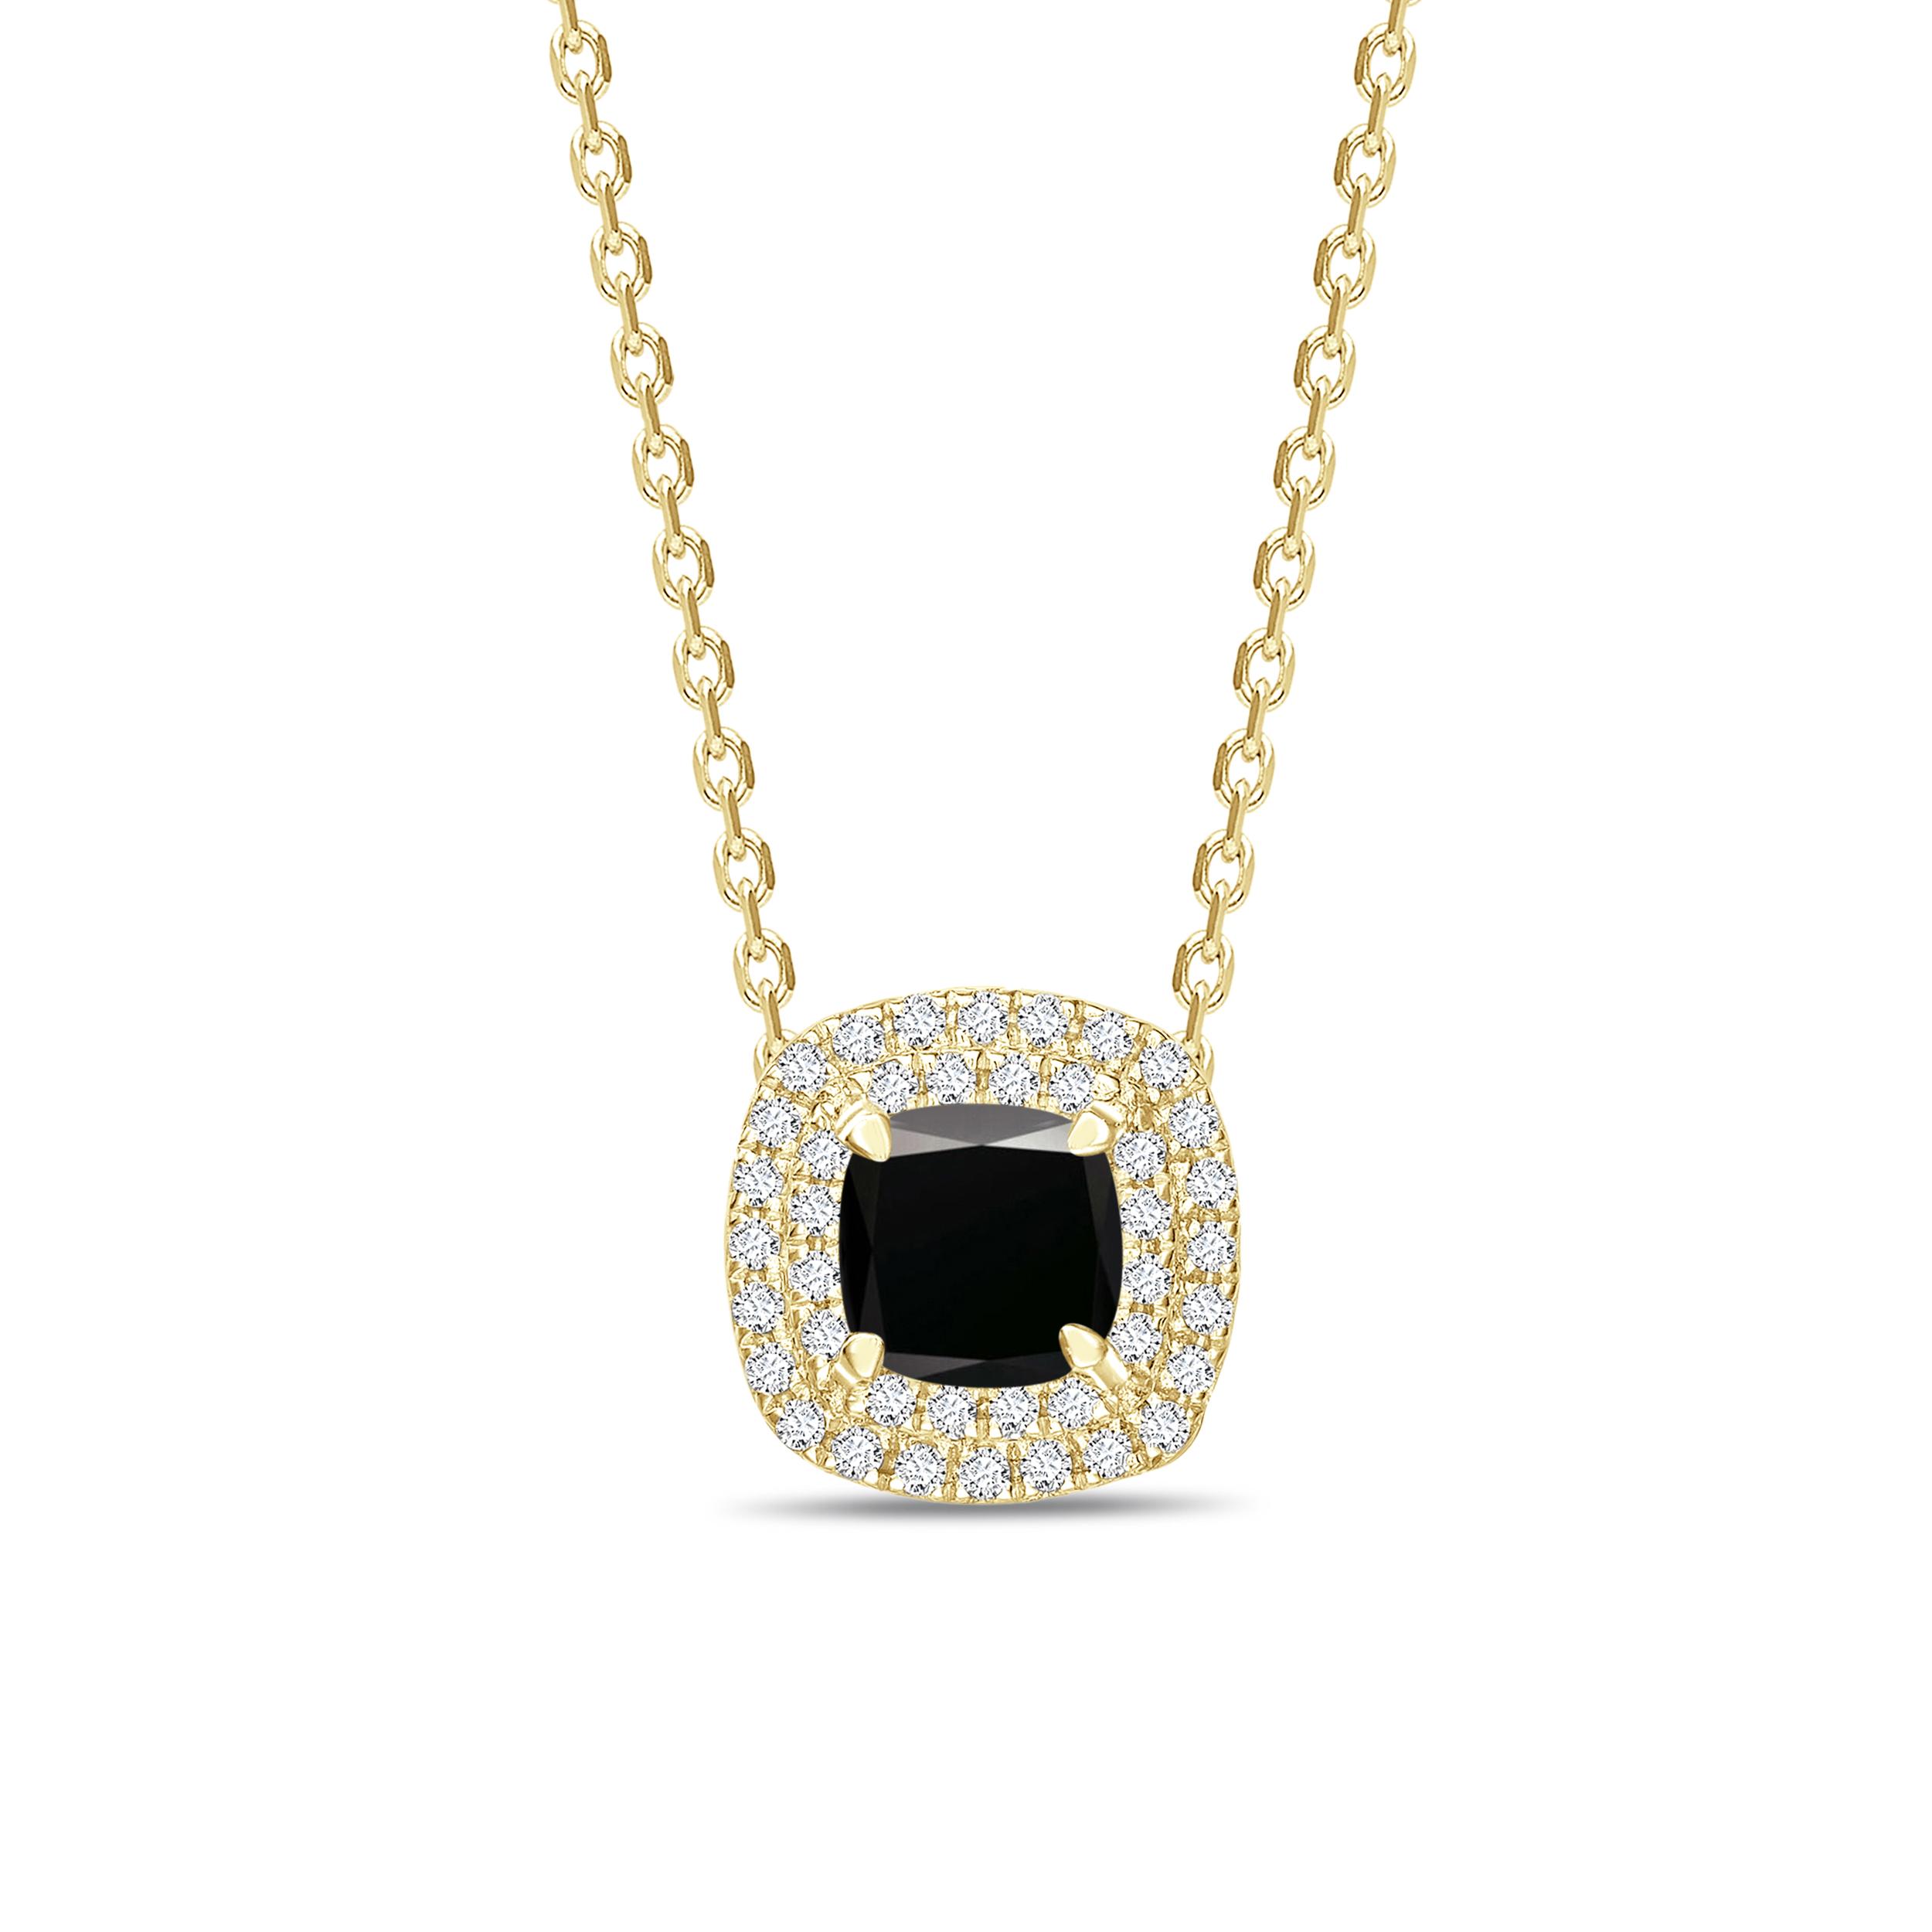 Halo Style Pricess Shape Black Diamond Solitaire Pendants Necklace